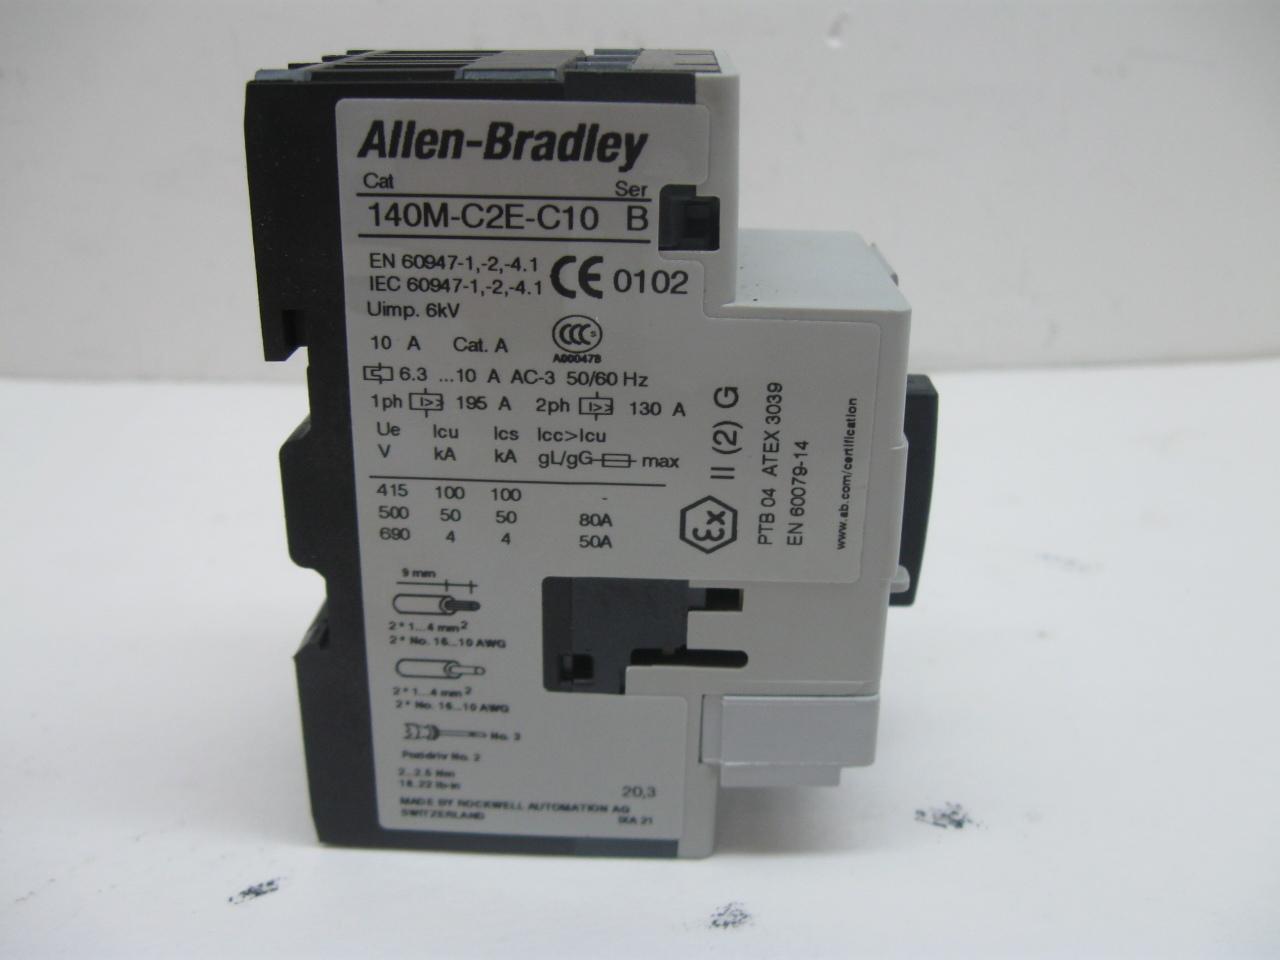 Allen bradley 140m c2e b16 series b manual motor starter 1 for Allen bradley manual motor starter